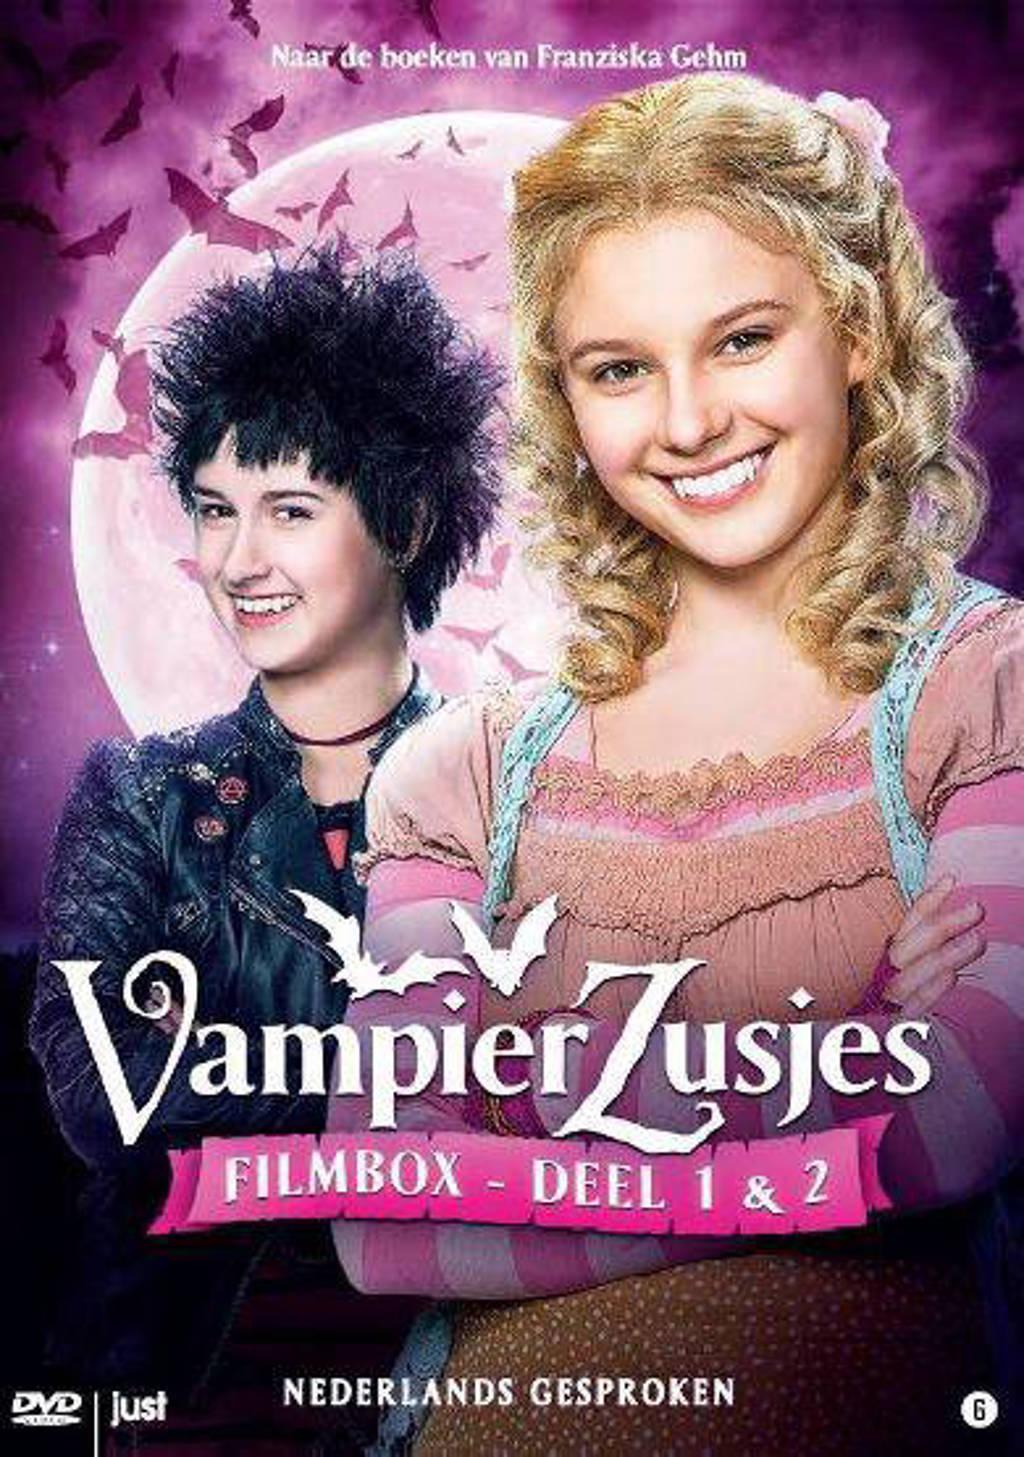 Vampier zusjes 1 & 2 (DVD)